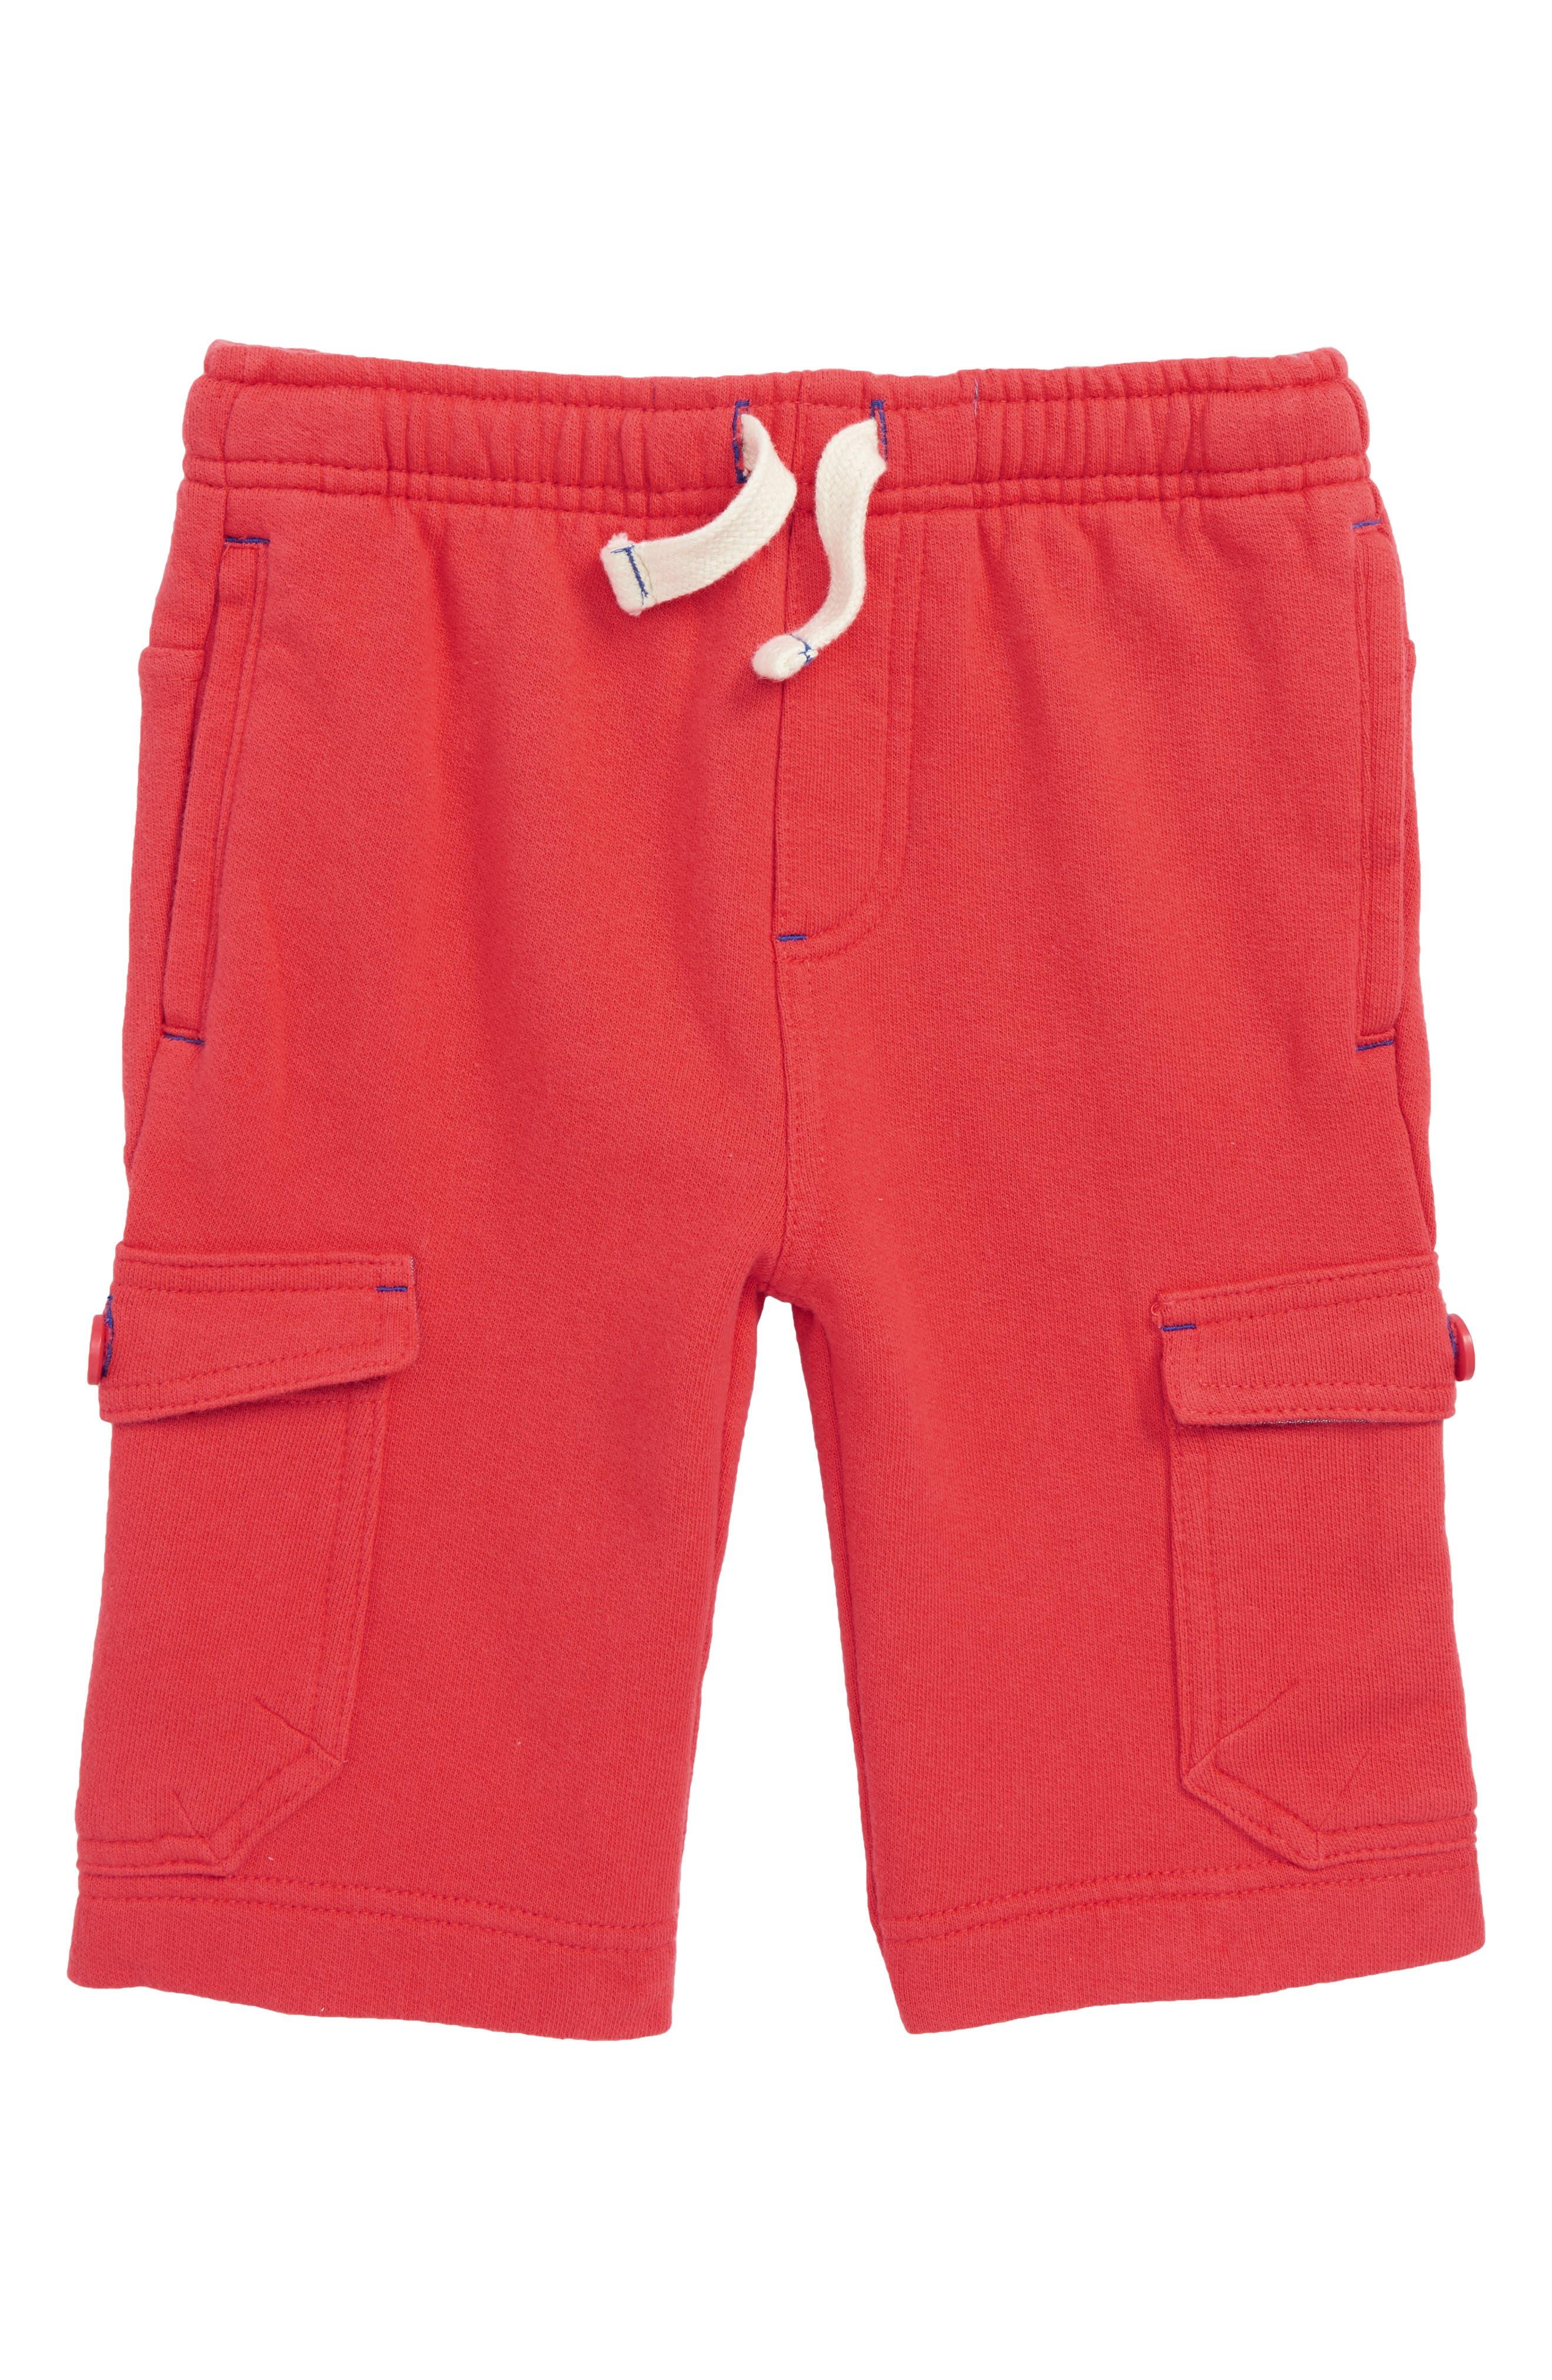 Jersey Cargo Shorts,                             Main thumbnail 1, color,                             Jam Red